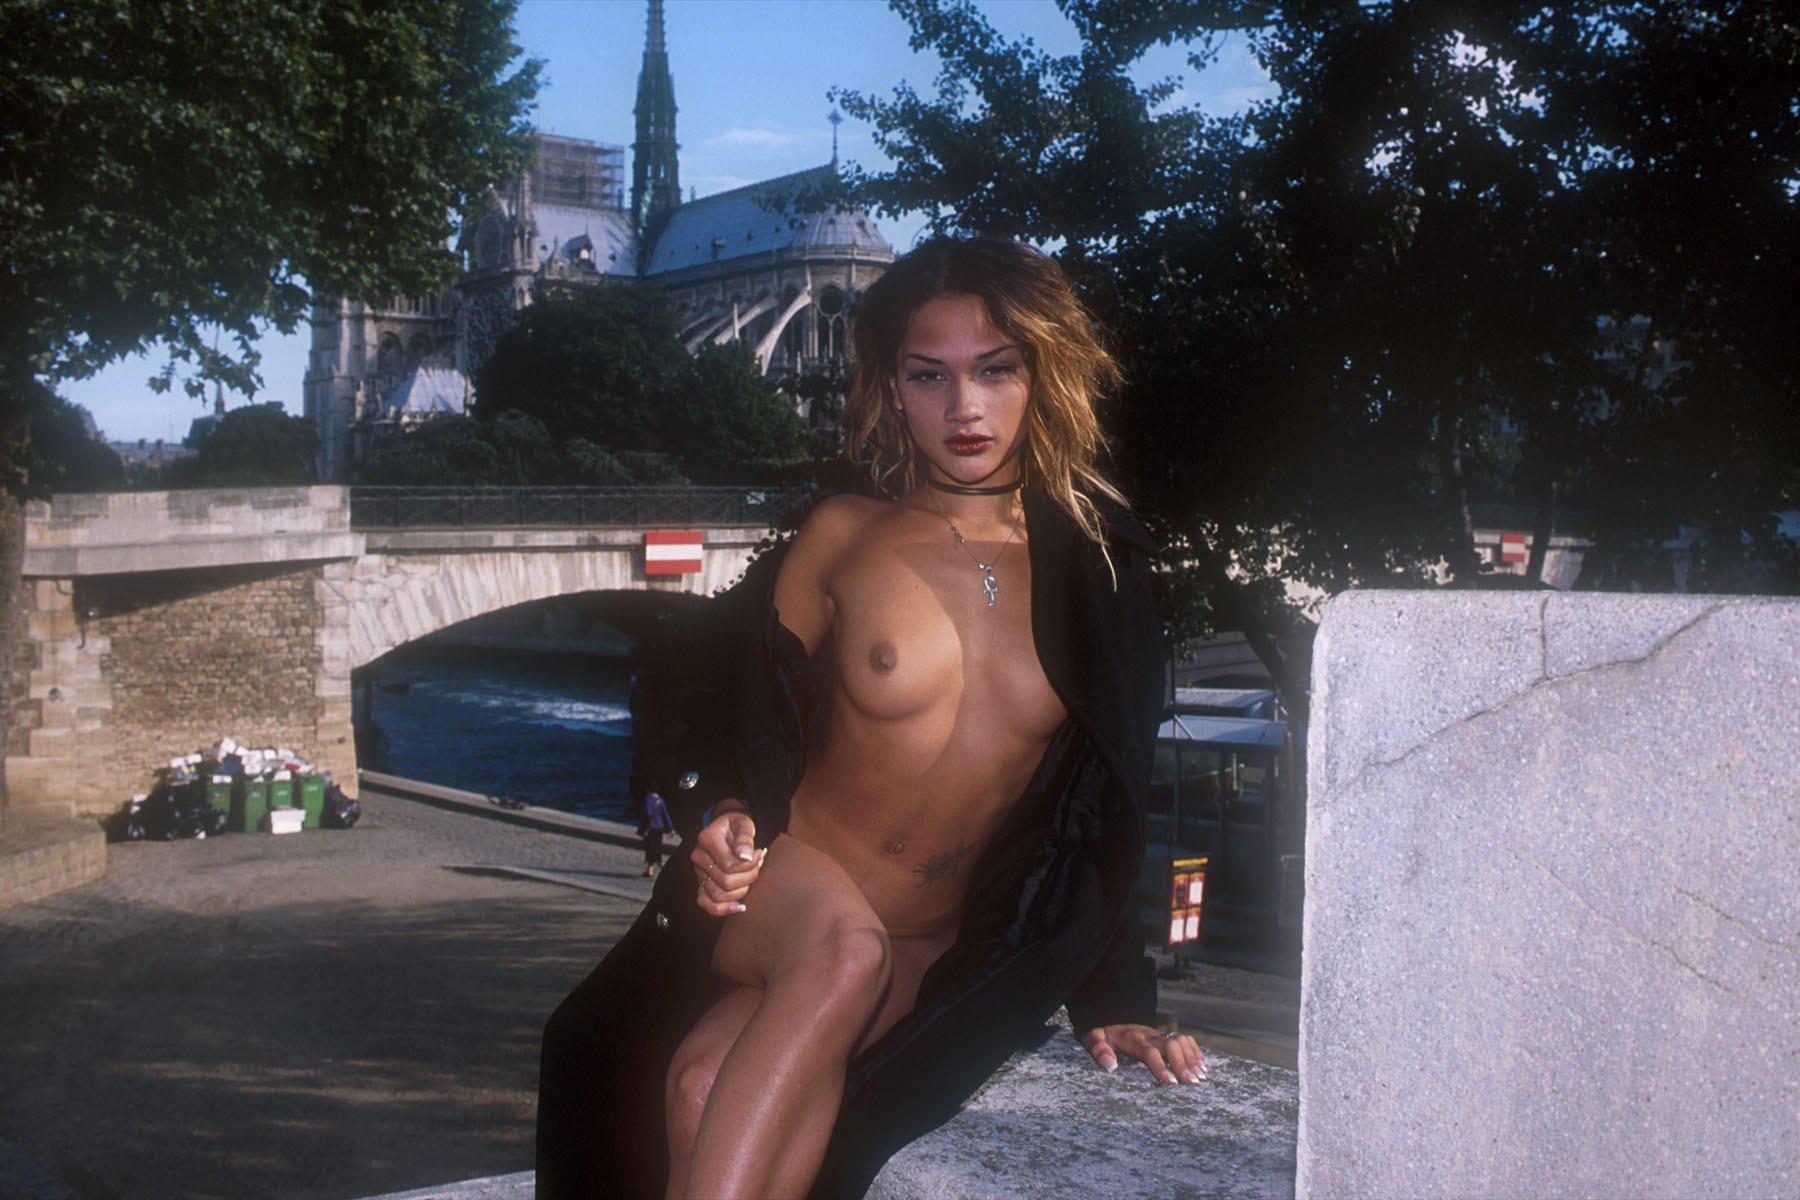 https://boobsmo.com/content/132/boobsmo_com_0000__9.jpg